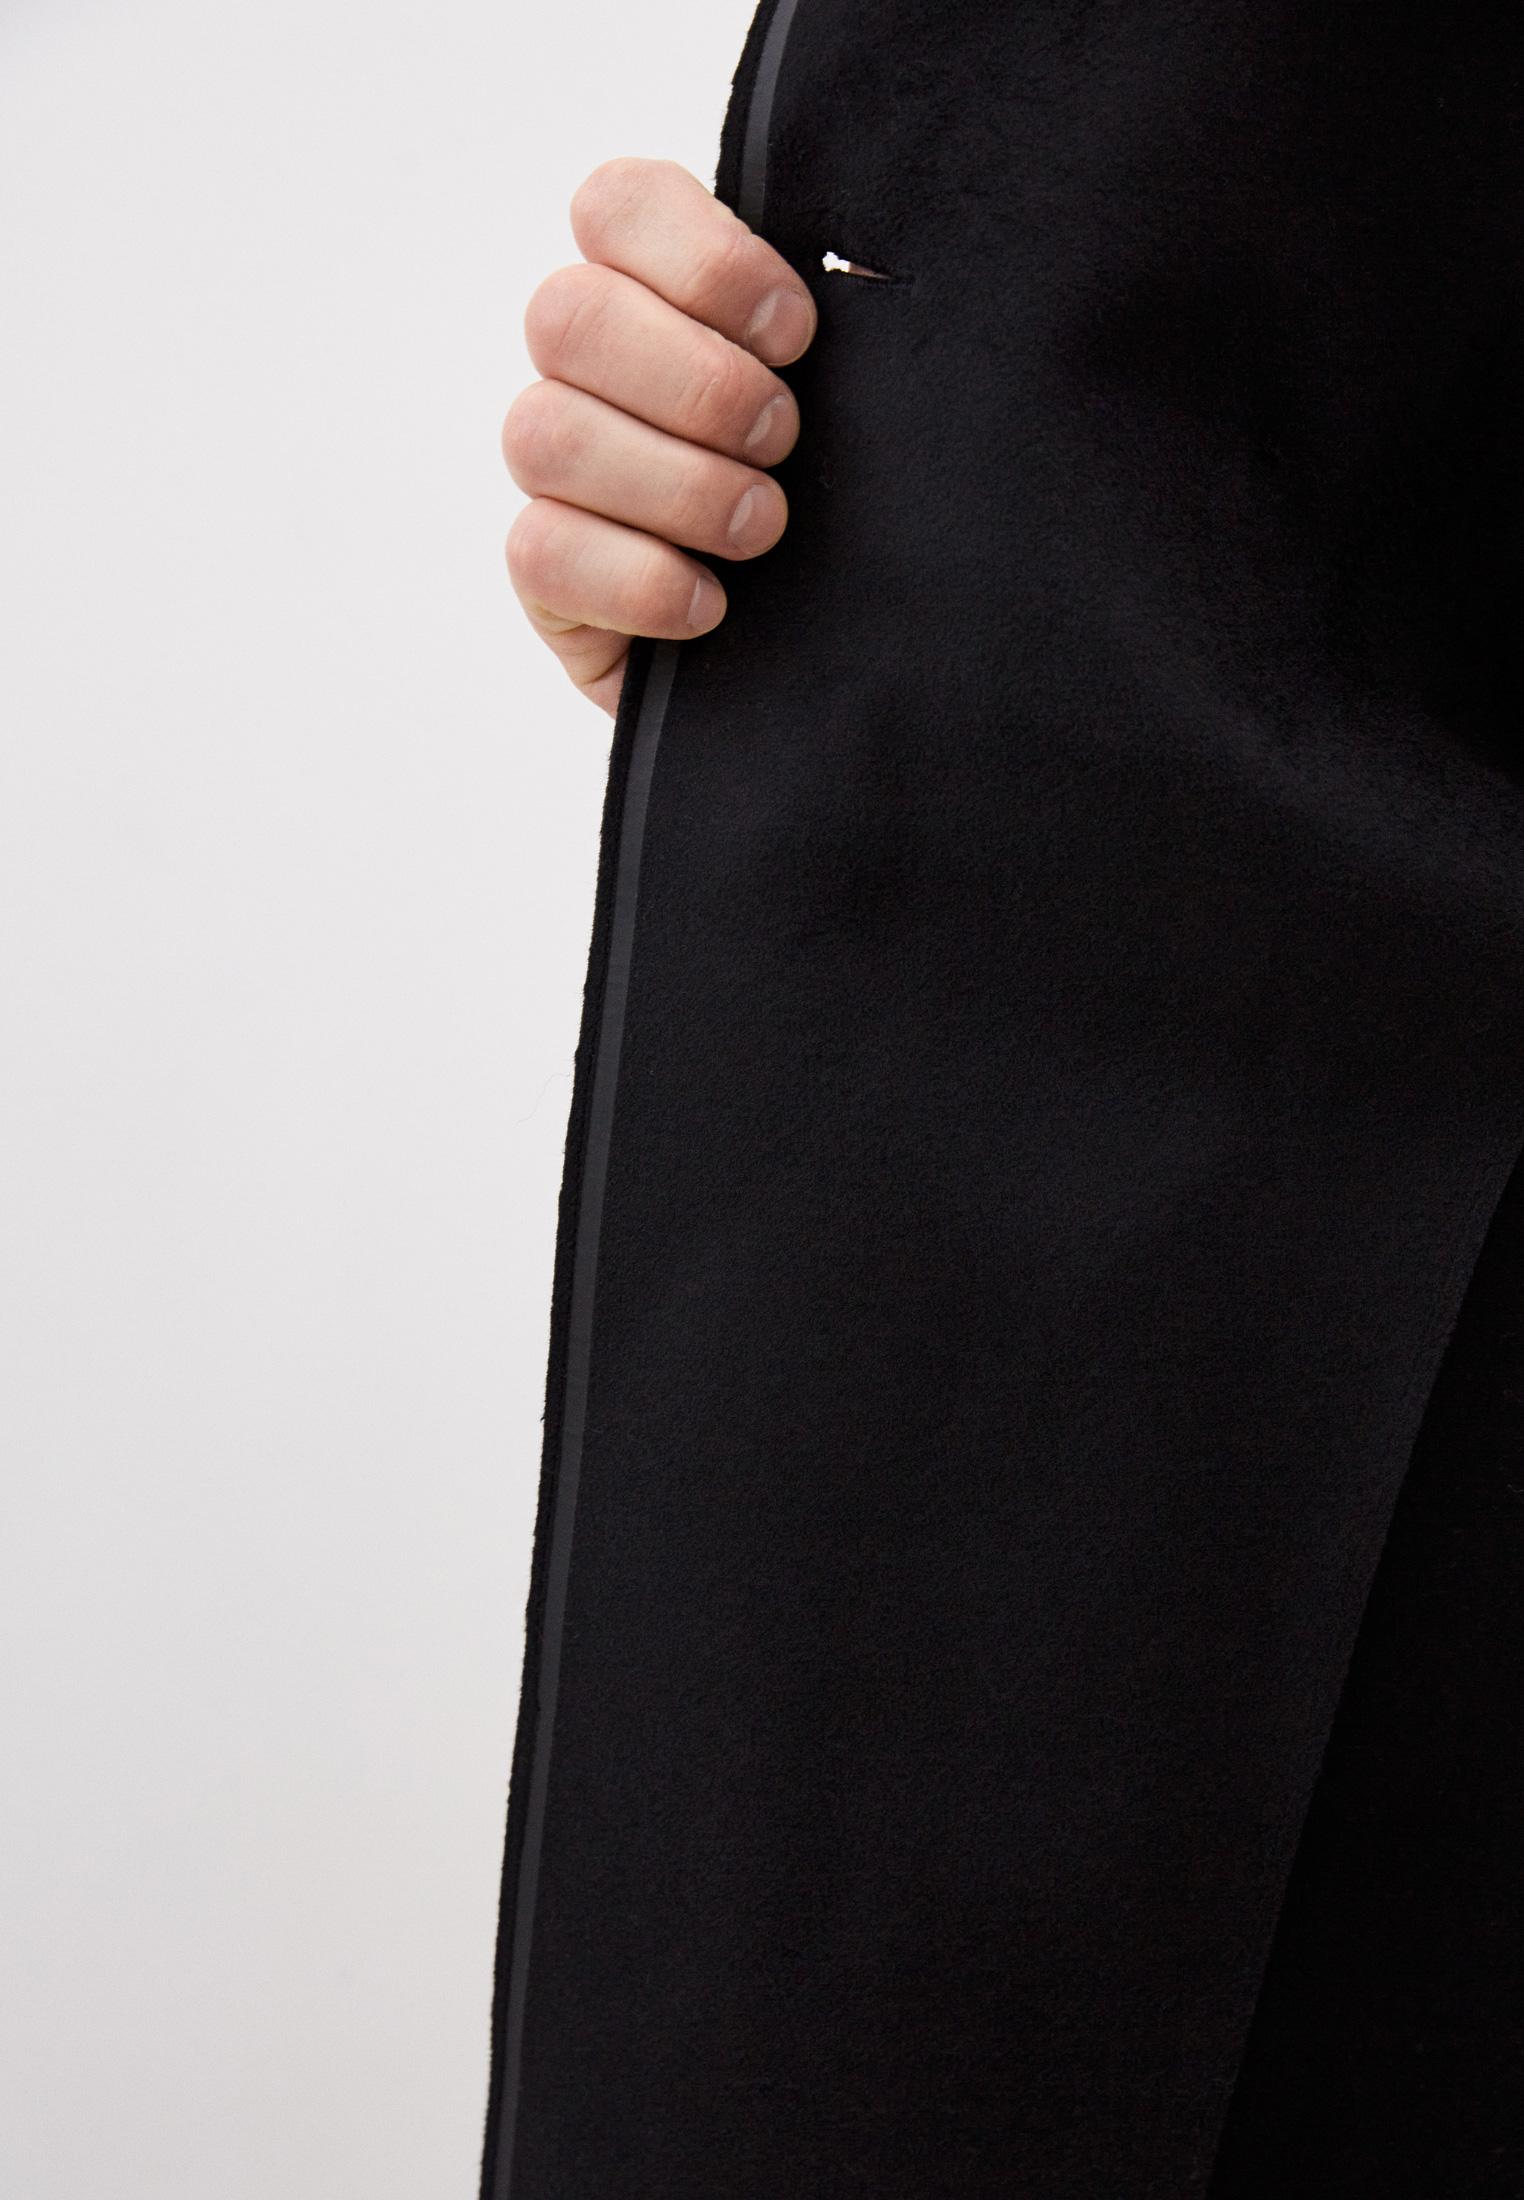 Мужское пальто Bikkembergs (Биккембергс) C J 005 01 T 9220: изображение 5